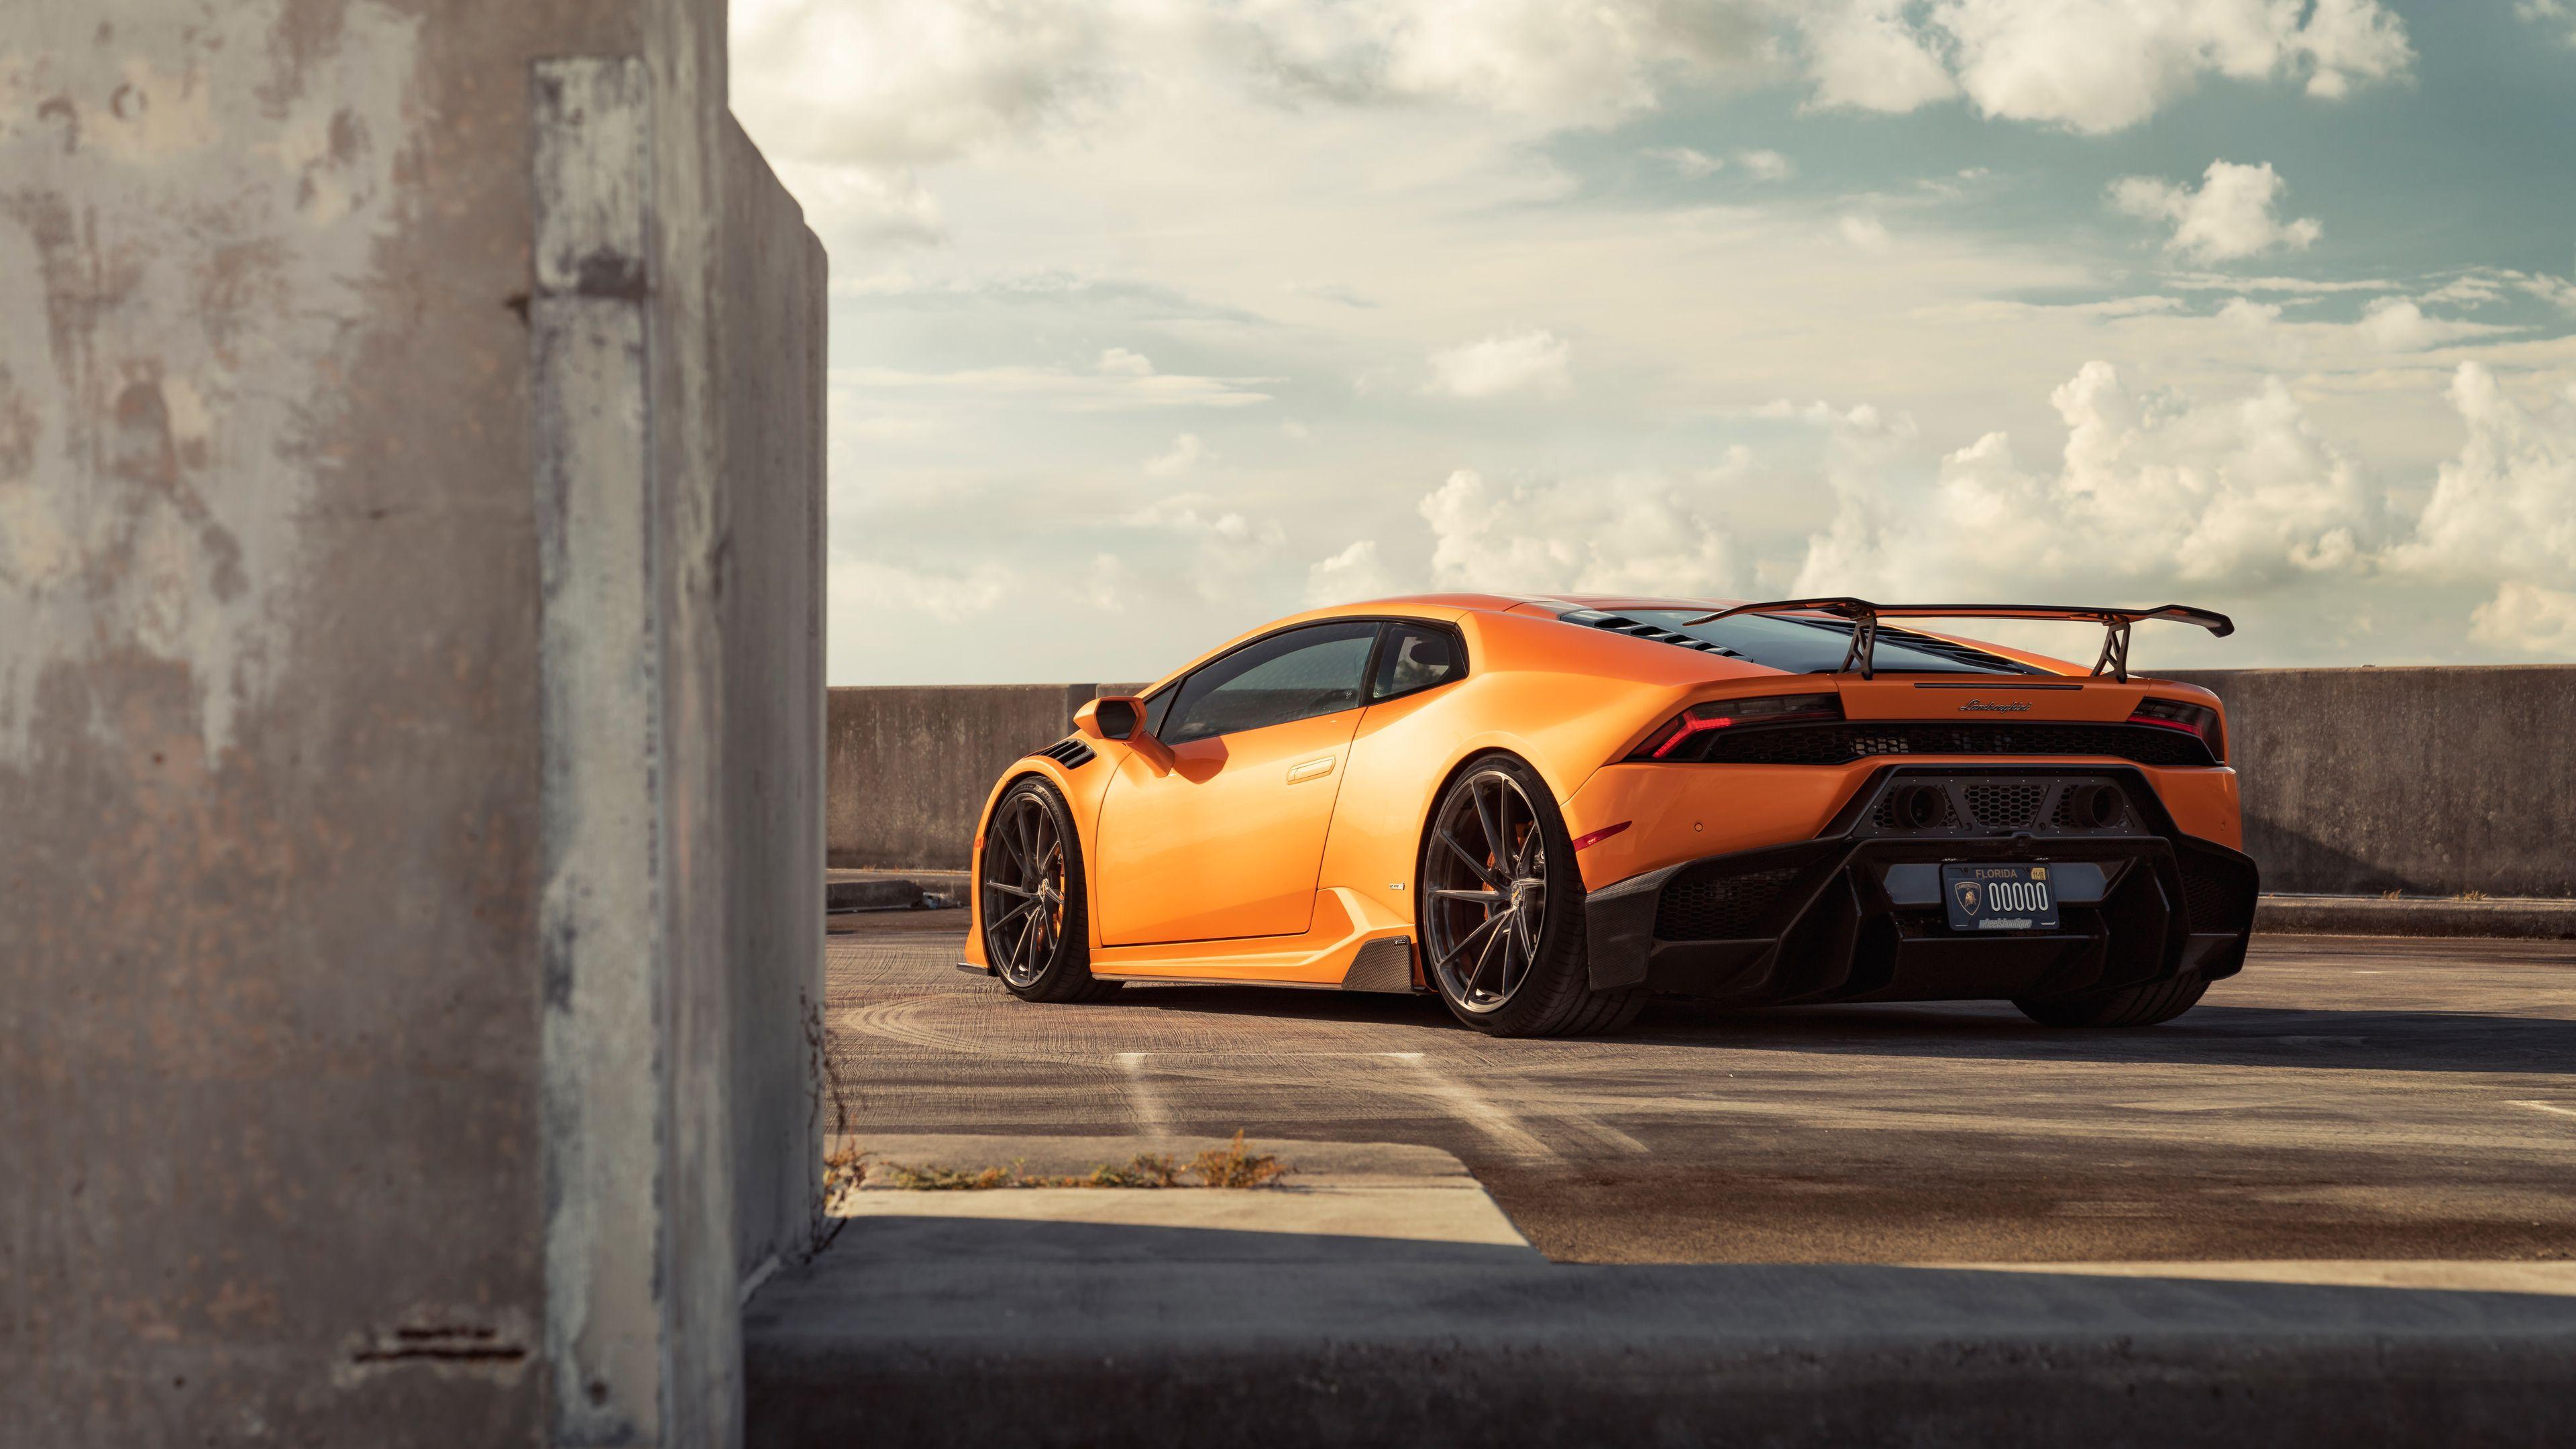 Chevrolet automotive wallpaper and high resolution images. Orange Lamborghini Wallpaper 4k 3840x2160 Wallpaper Teahub Io